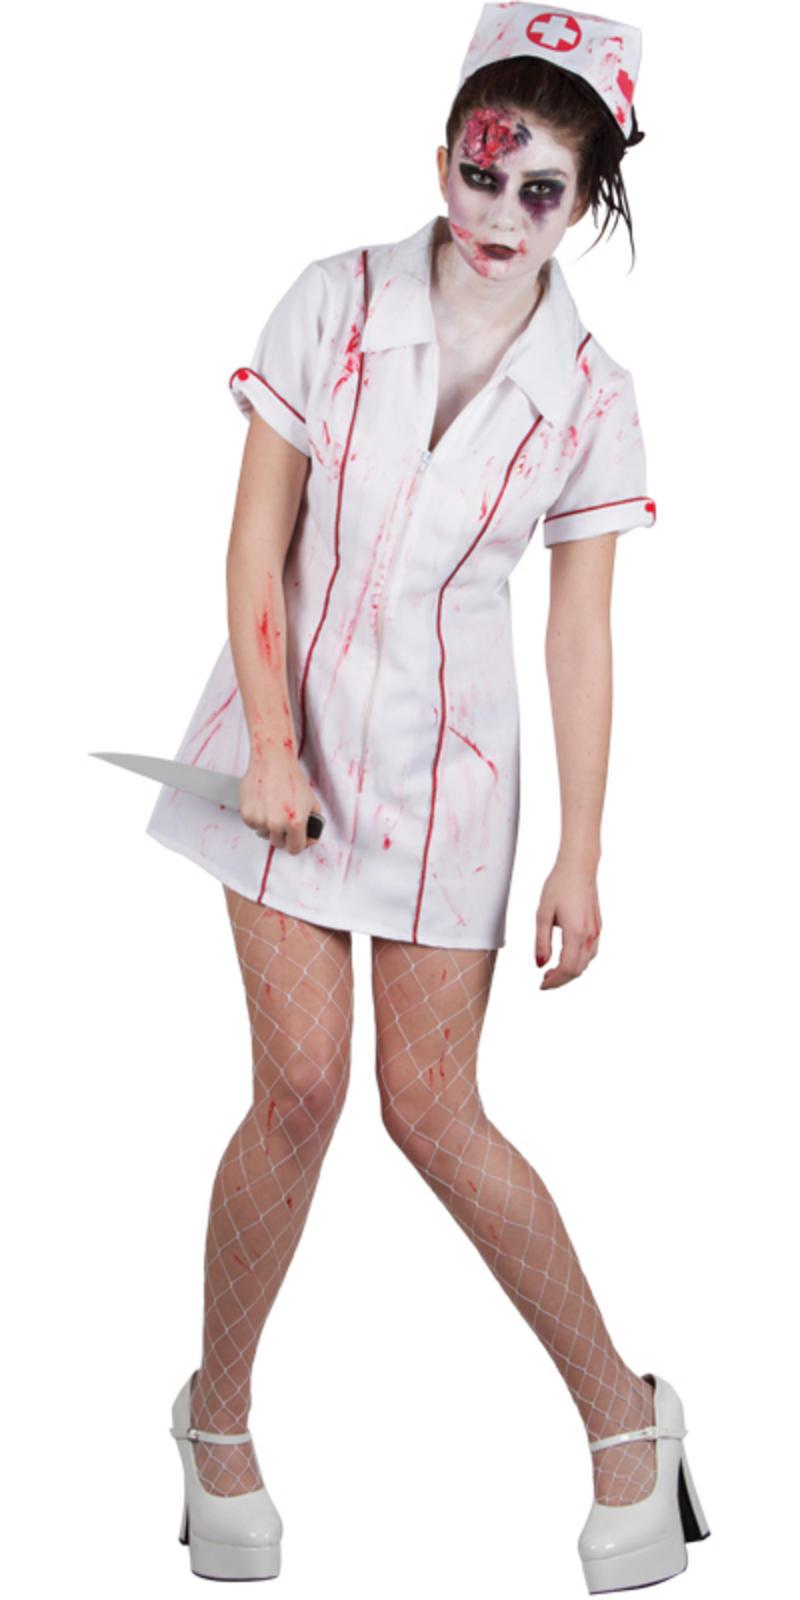 Костюм медсестры фото своими руками